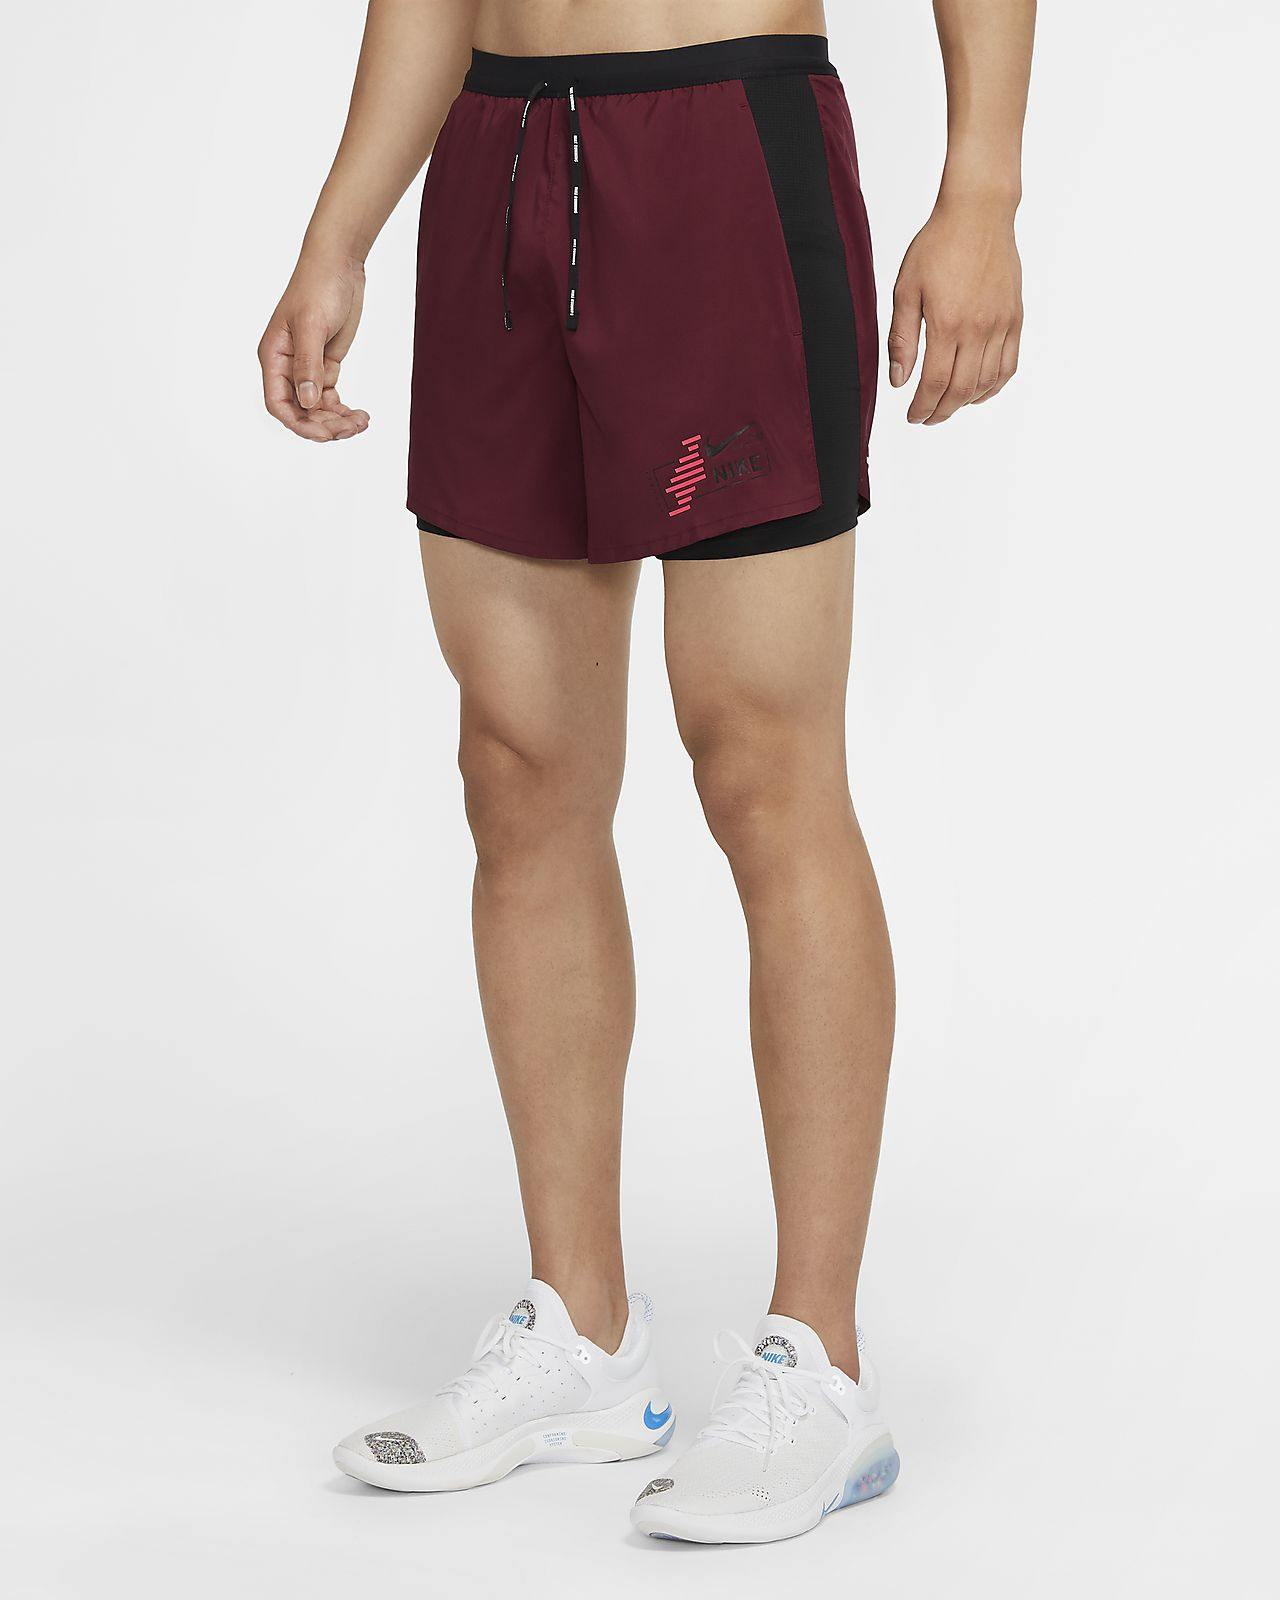 Nike Flex Stride Future Fast 2-In-1 男子跑步短裤